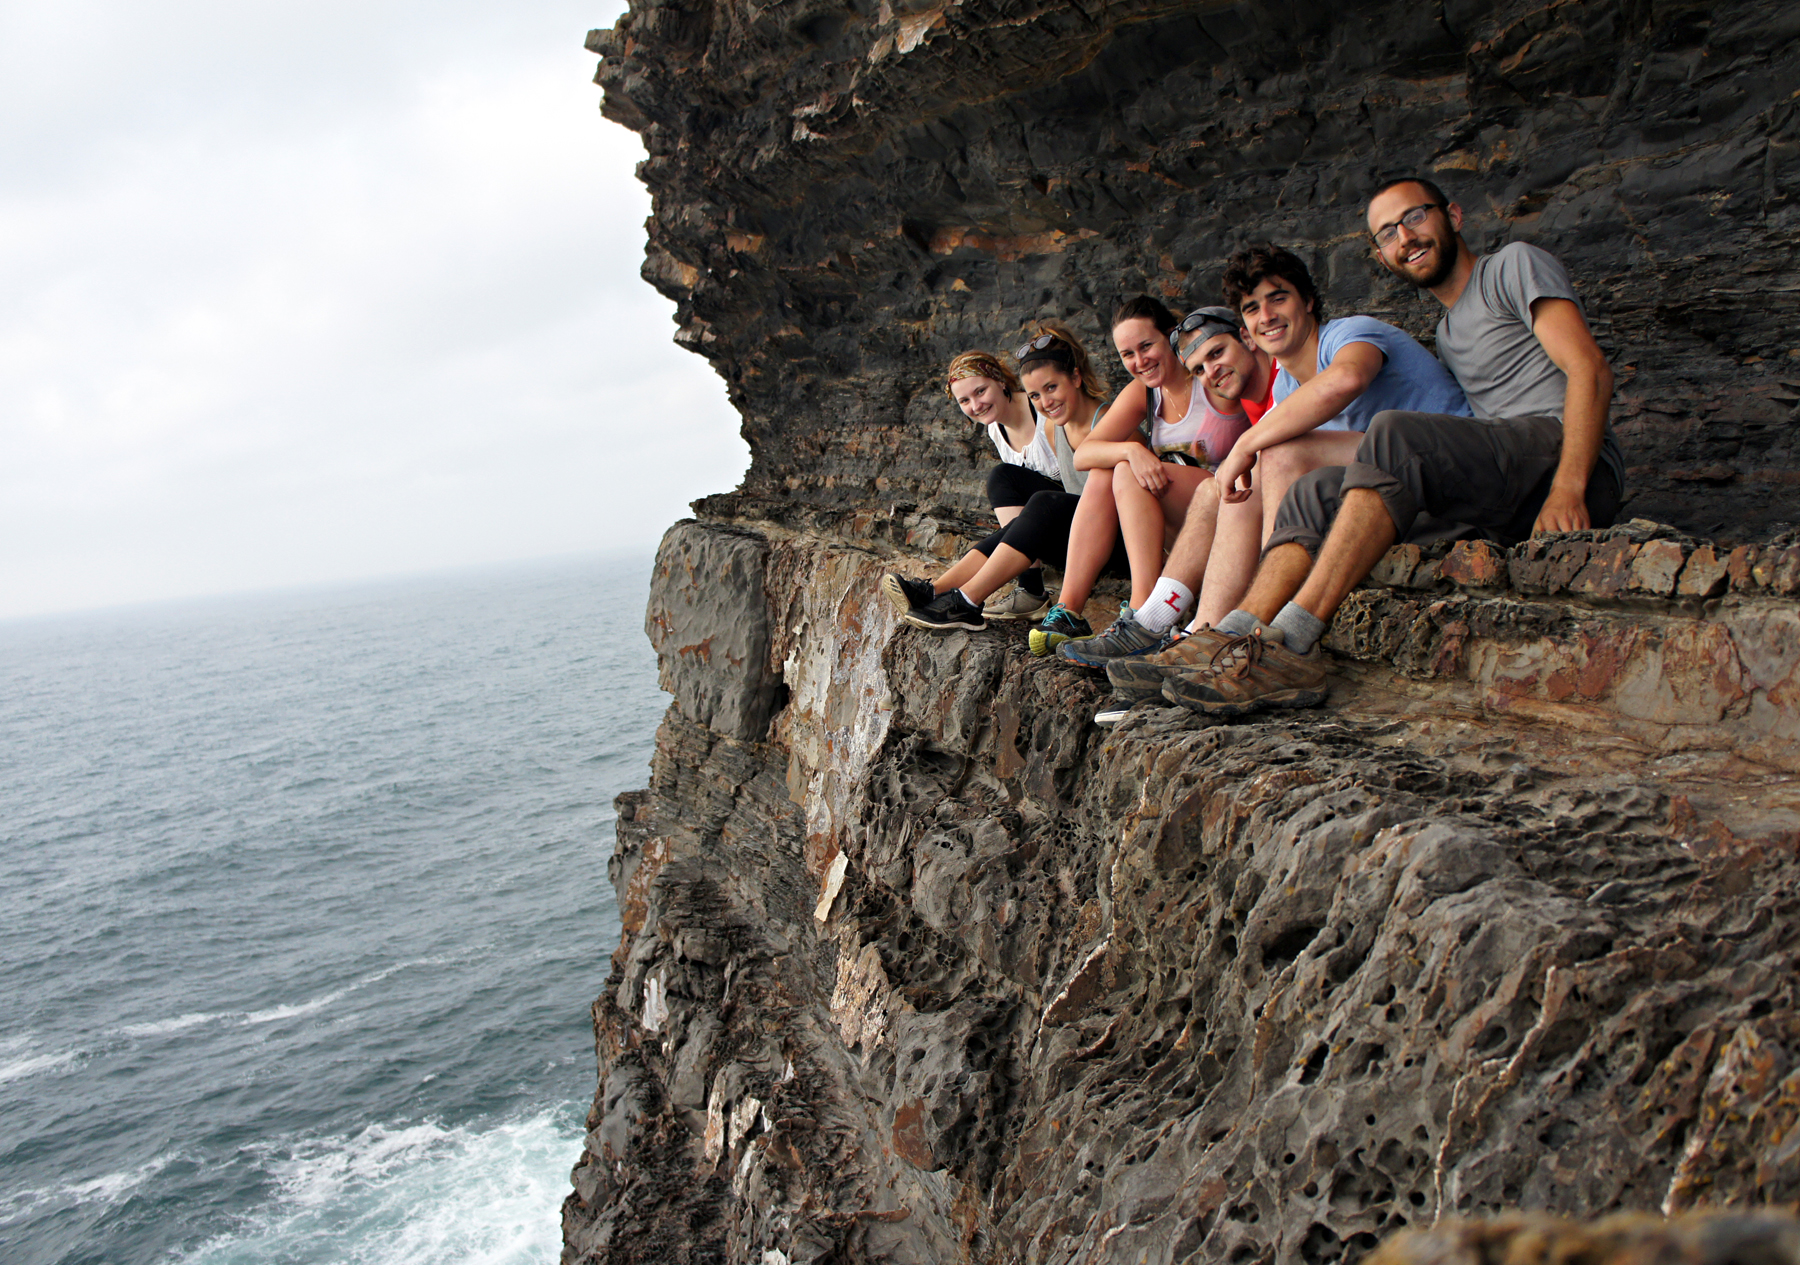 Cliff adventuring in Western Portugal